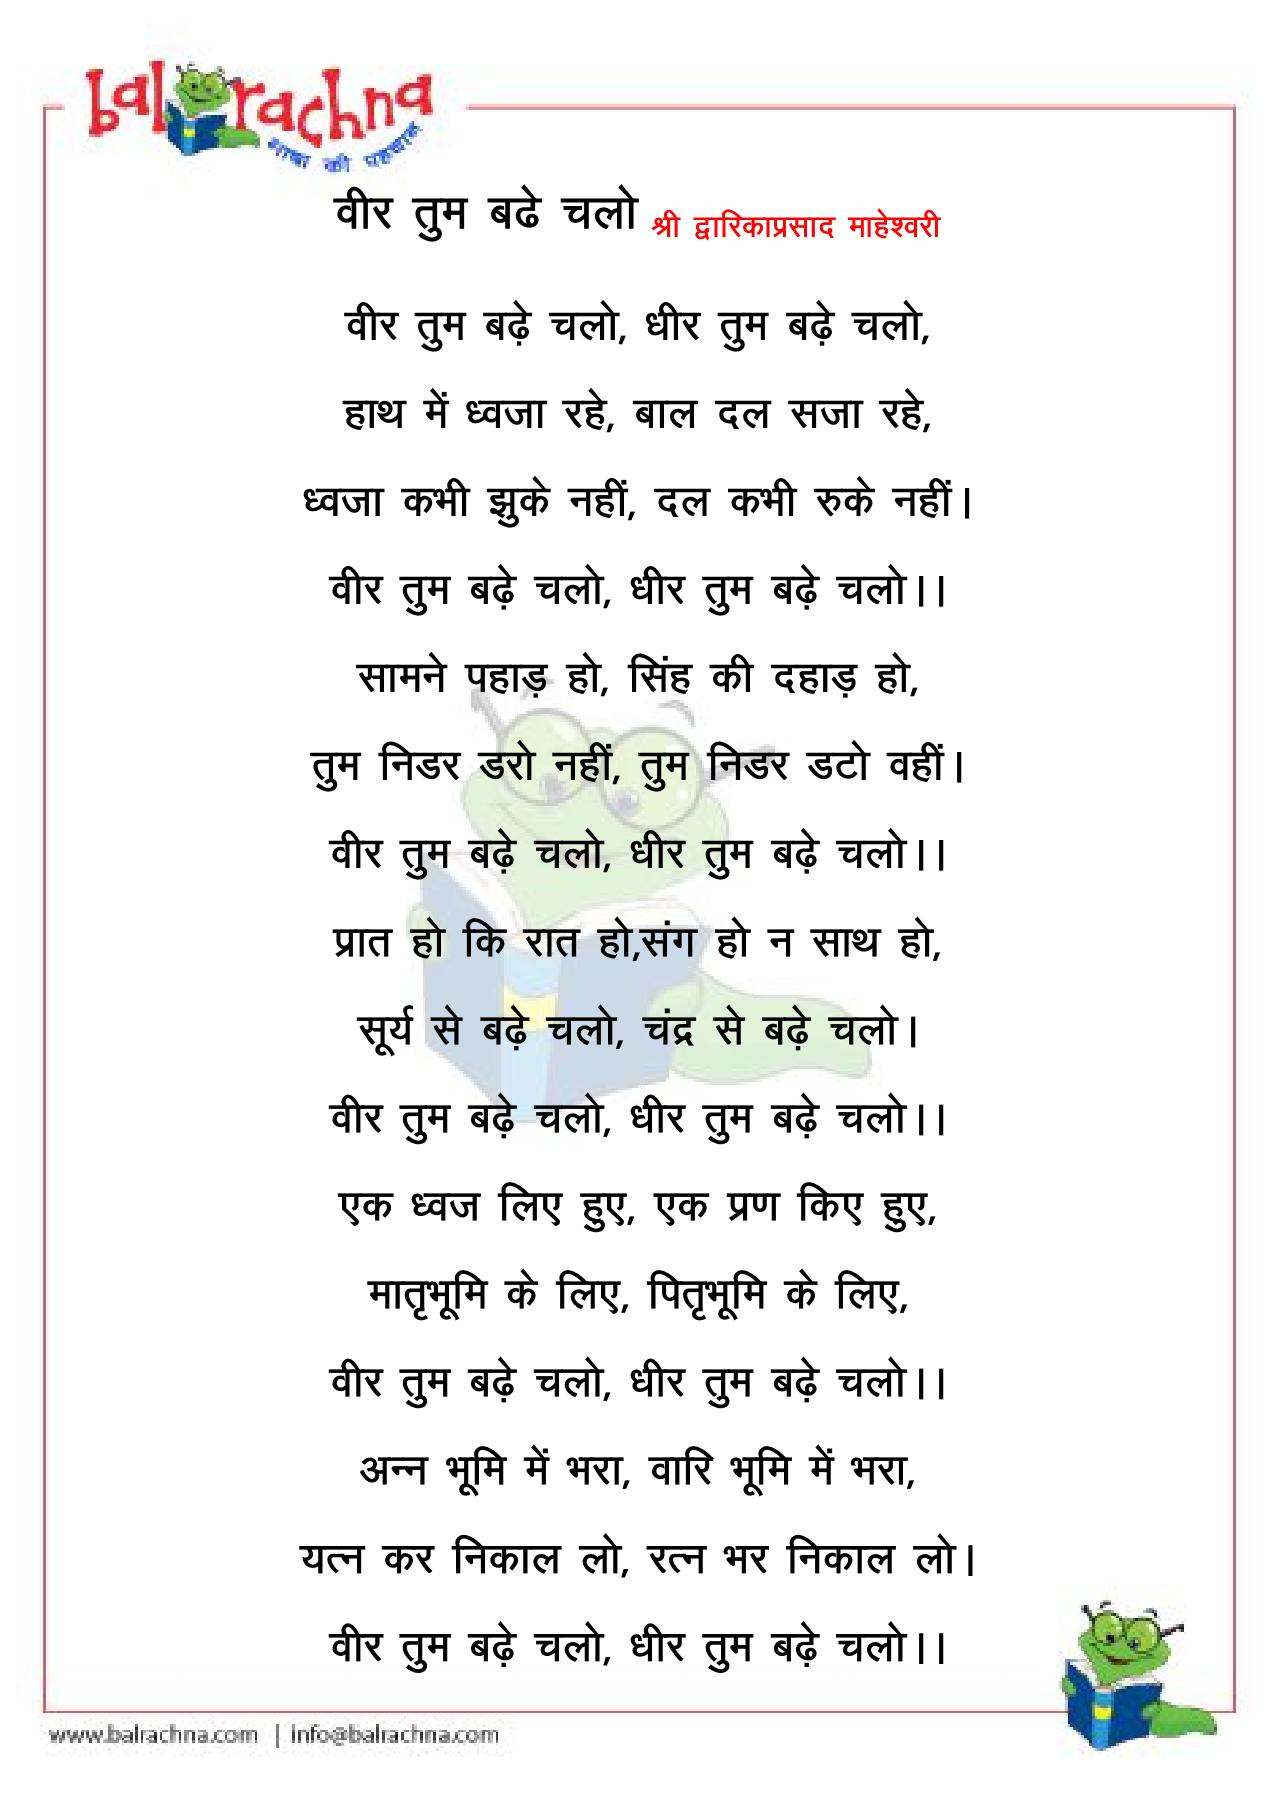 Pin By Rachna Maheshwari On Rachna Maheshwari Hindi Poems For Kids Hindi Poems For Kids Motivational Quotes In Hindi Hindi Worksheets [ 1803 x 1275 Pixel ]